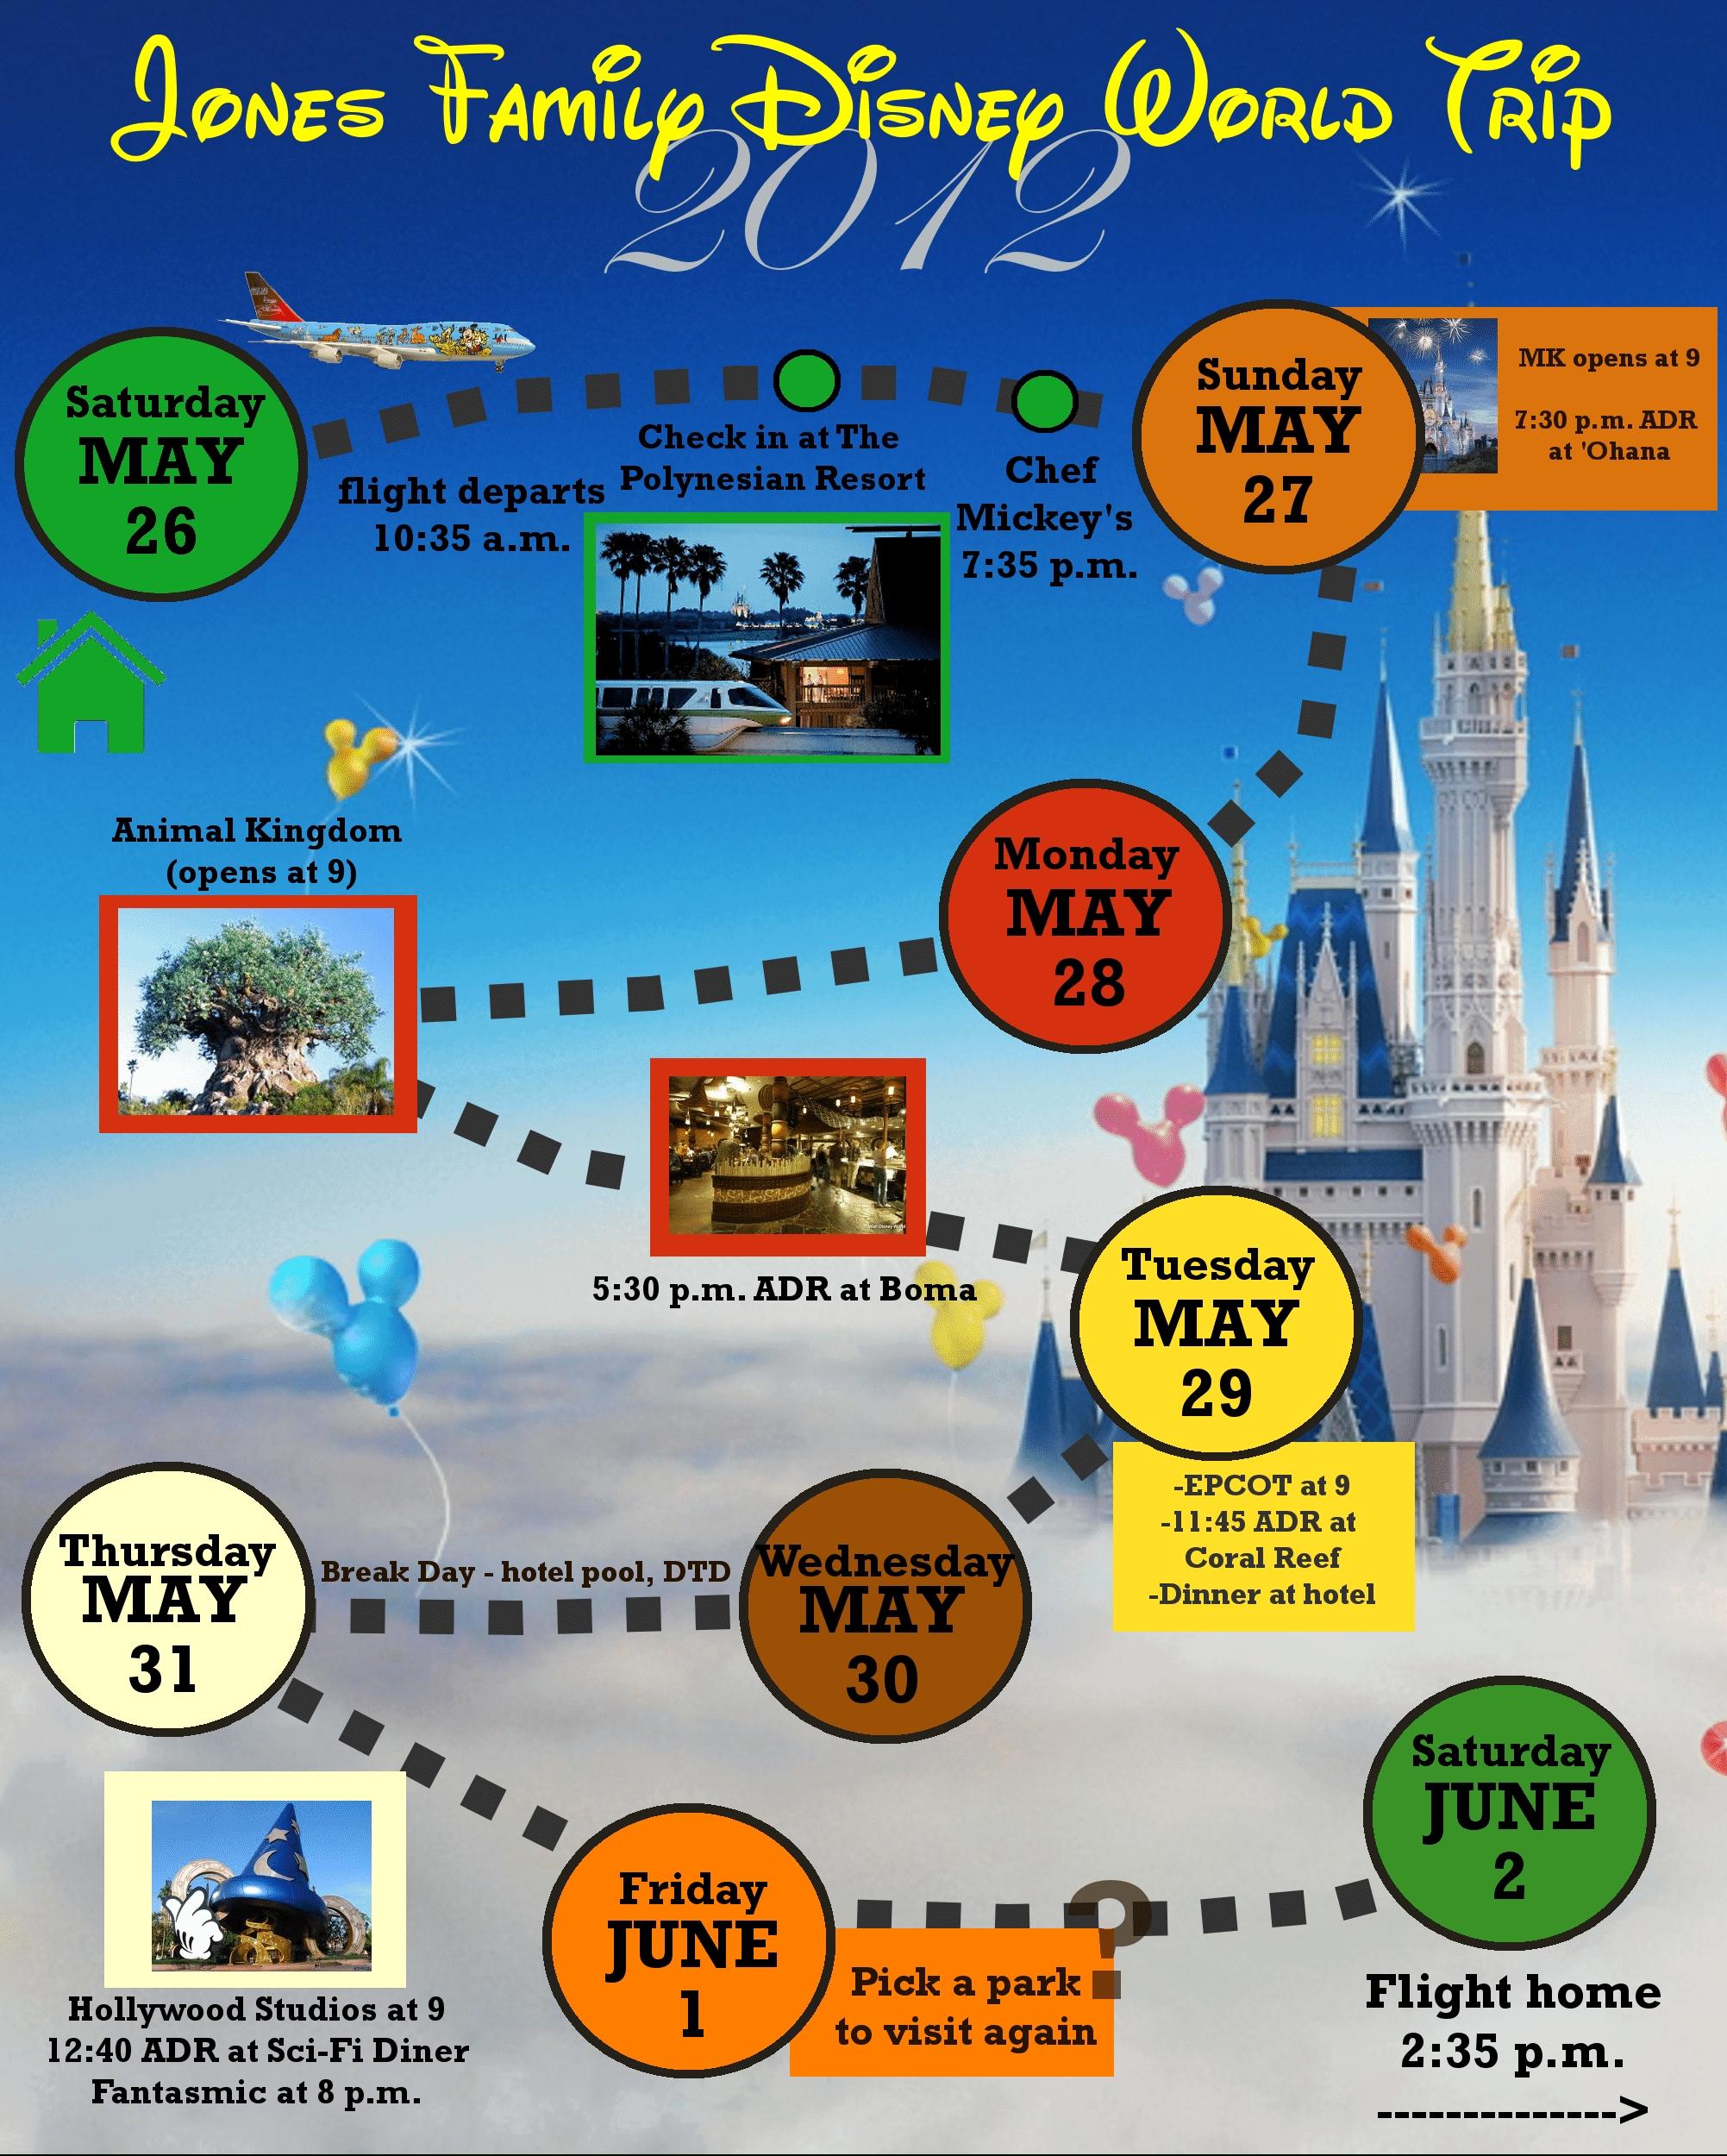 2 Custom Disney World Itinerary Templates | Wdw Prep School-Template For Wdw Itinerary